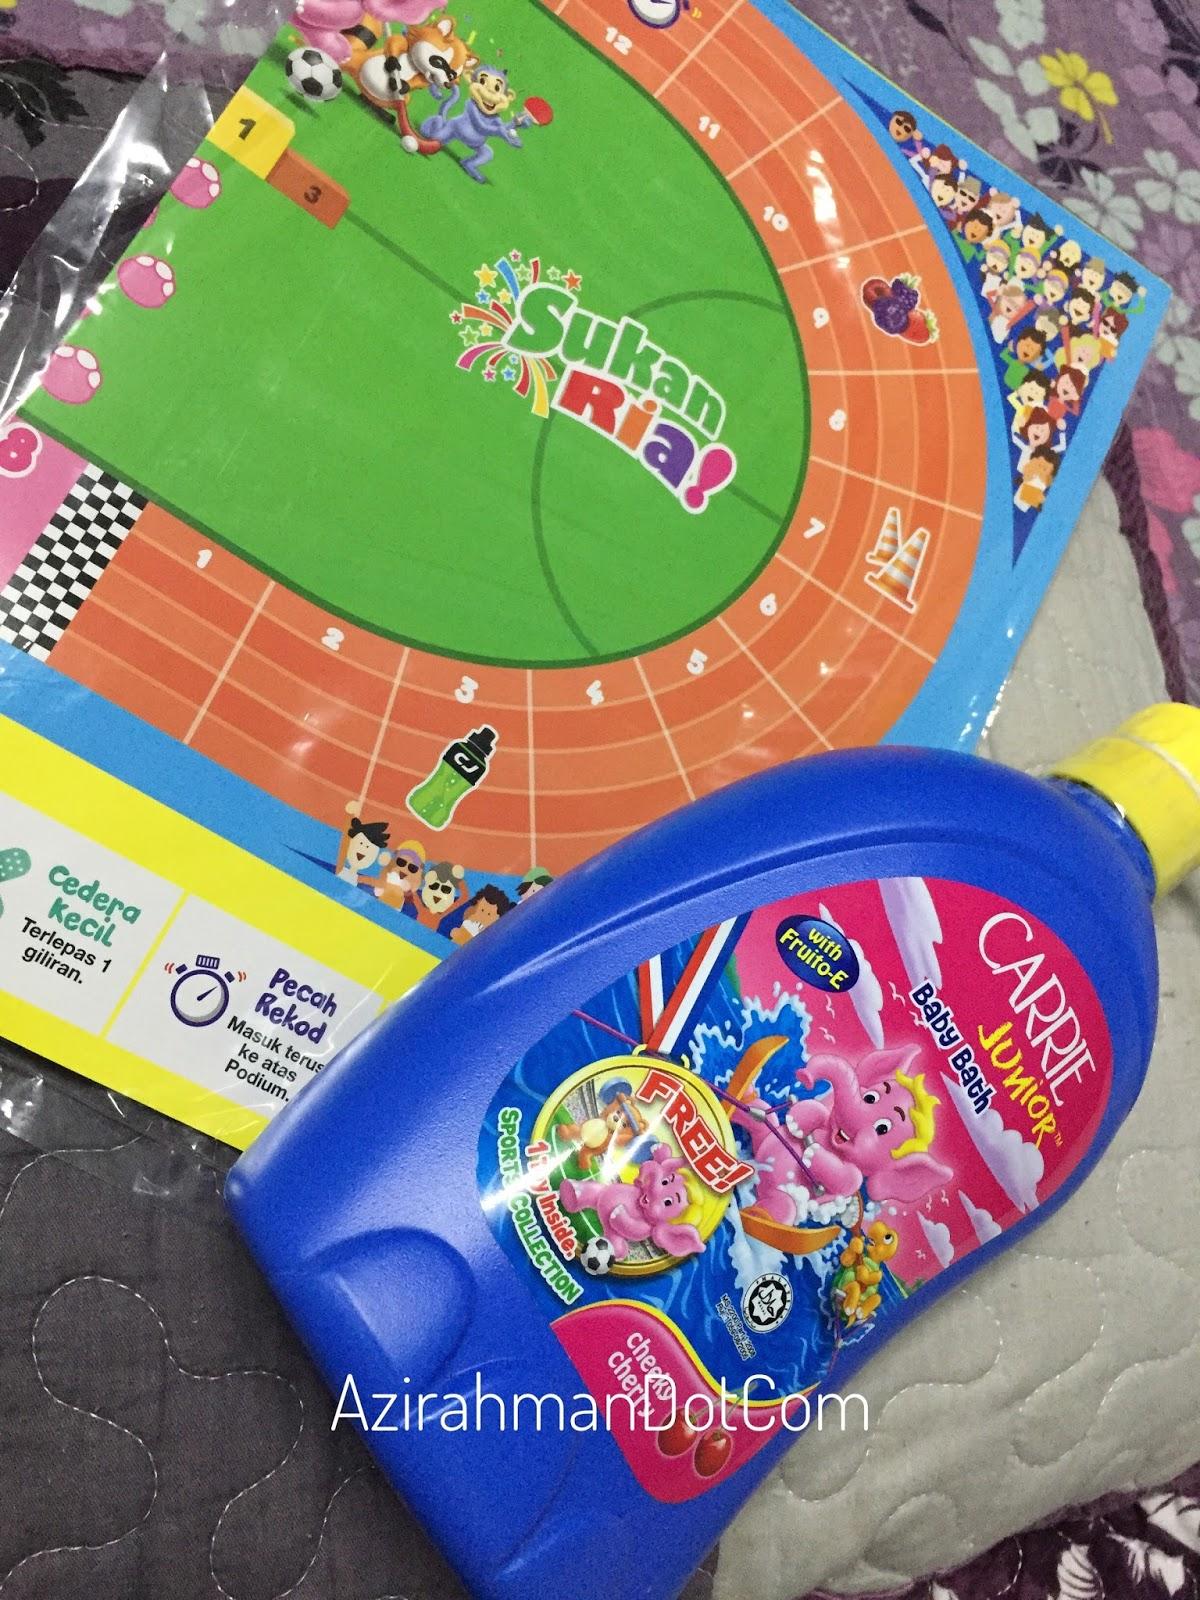 carrie junior collection, rangkaian produk carrie junior, hadiah untuk si manja, mandian si manja, anak-anak kreatif